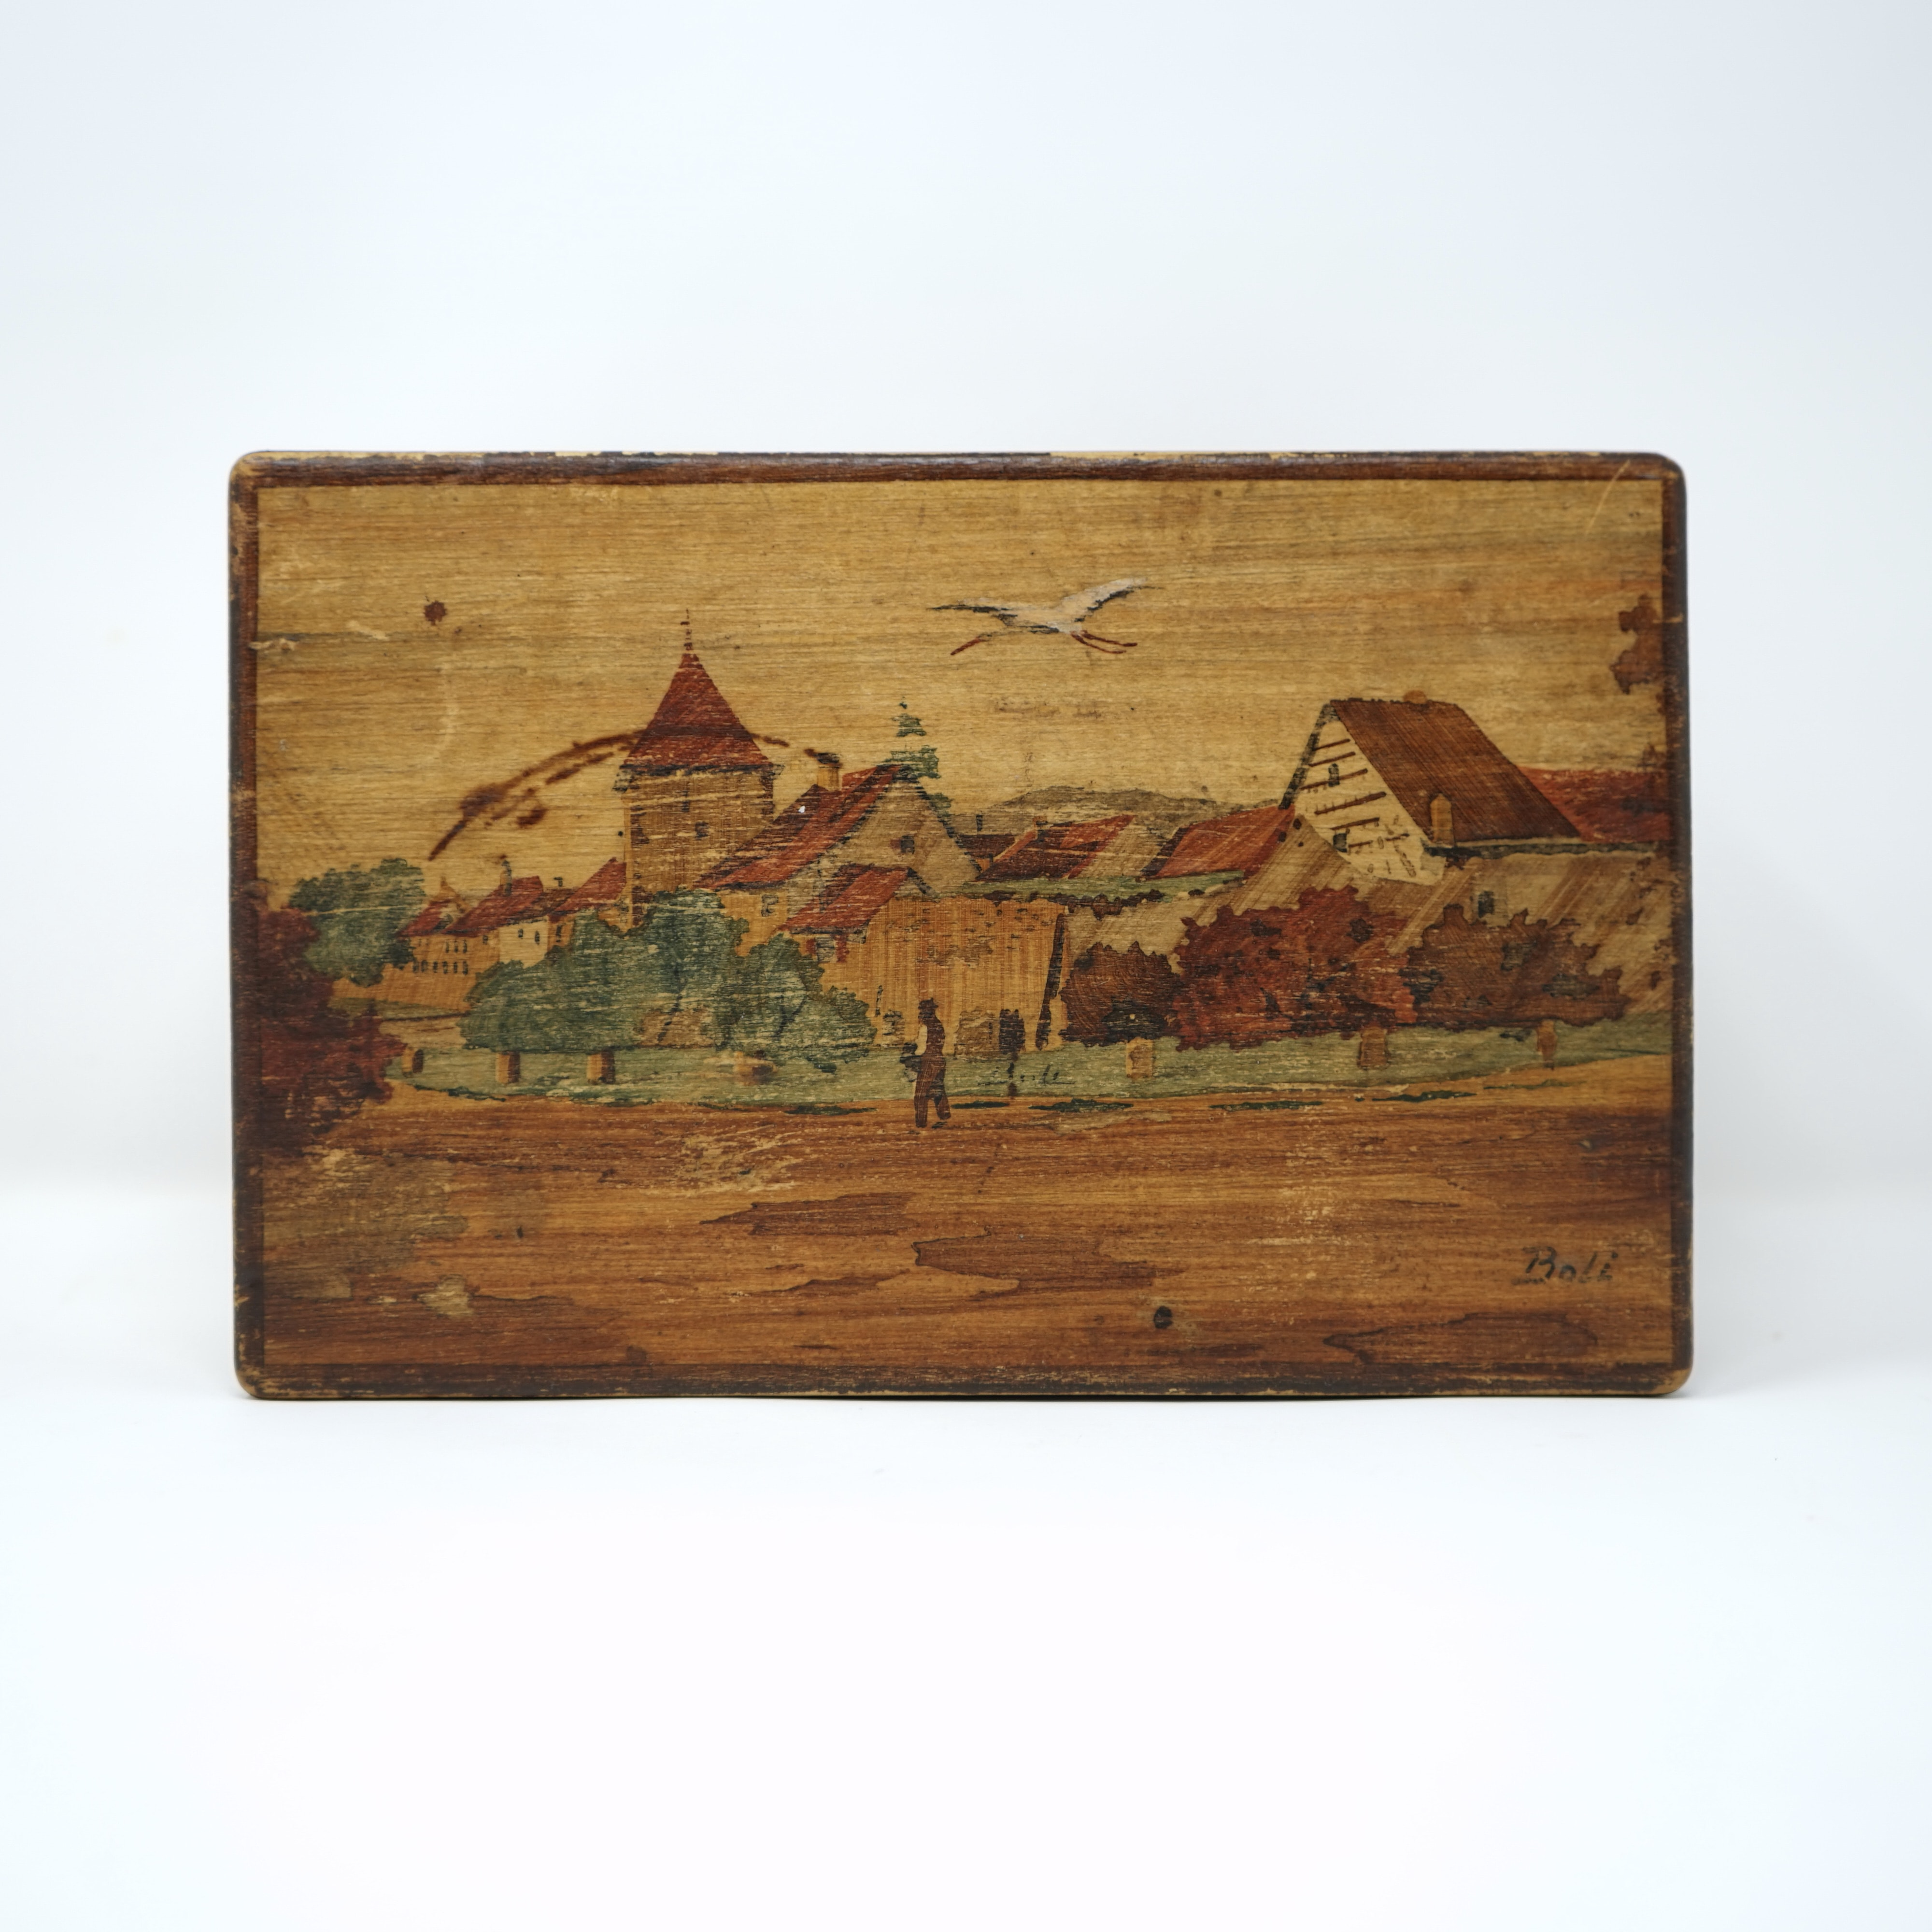 Boîte en Bois Signée Boli